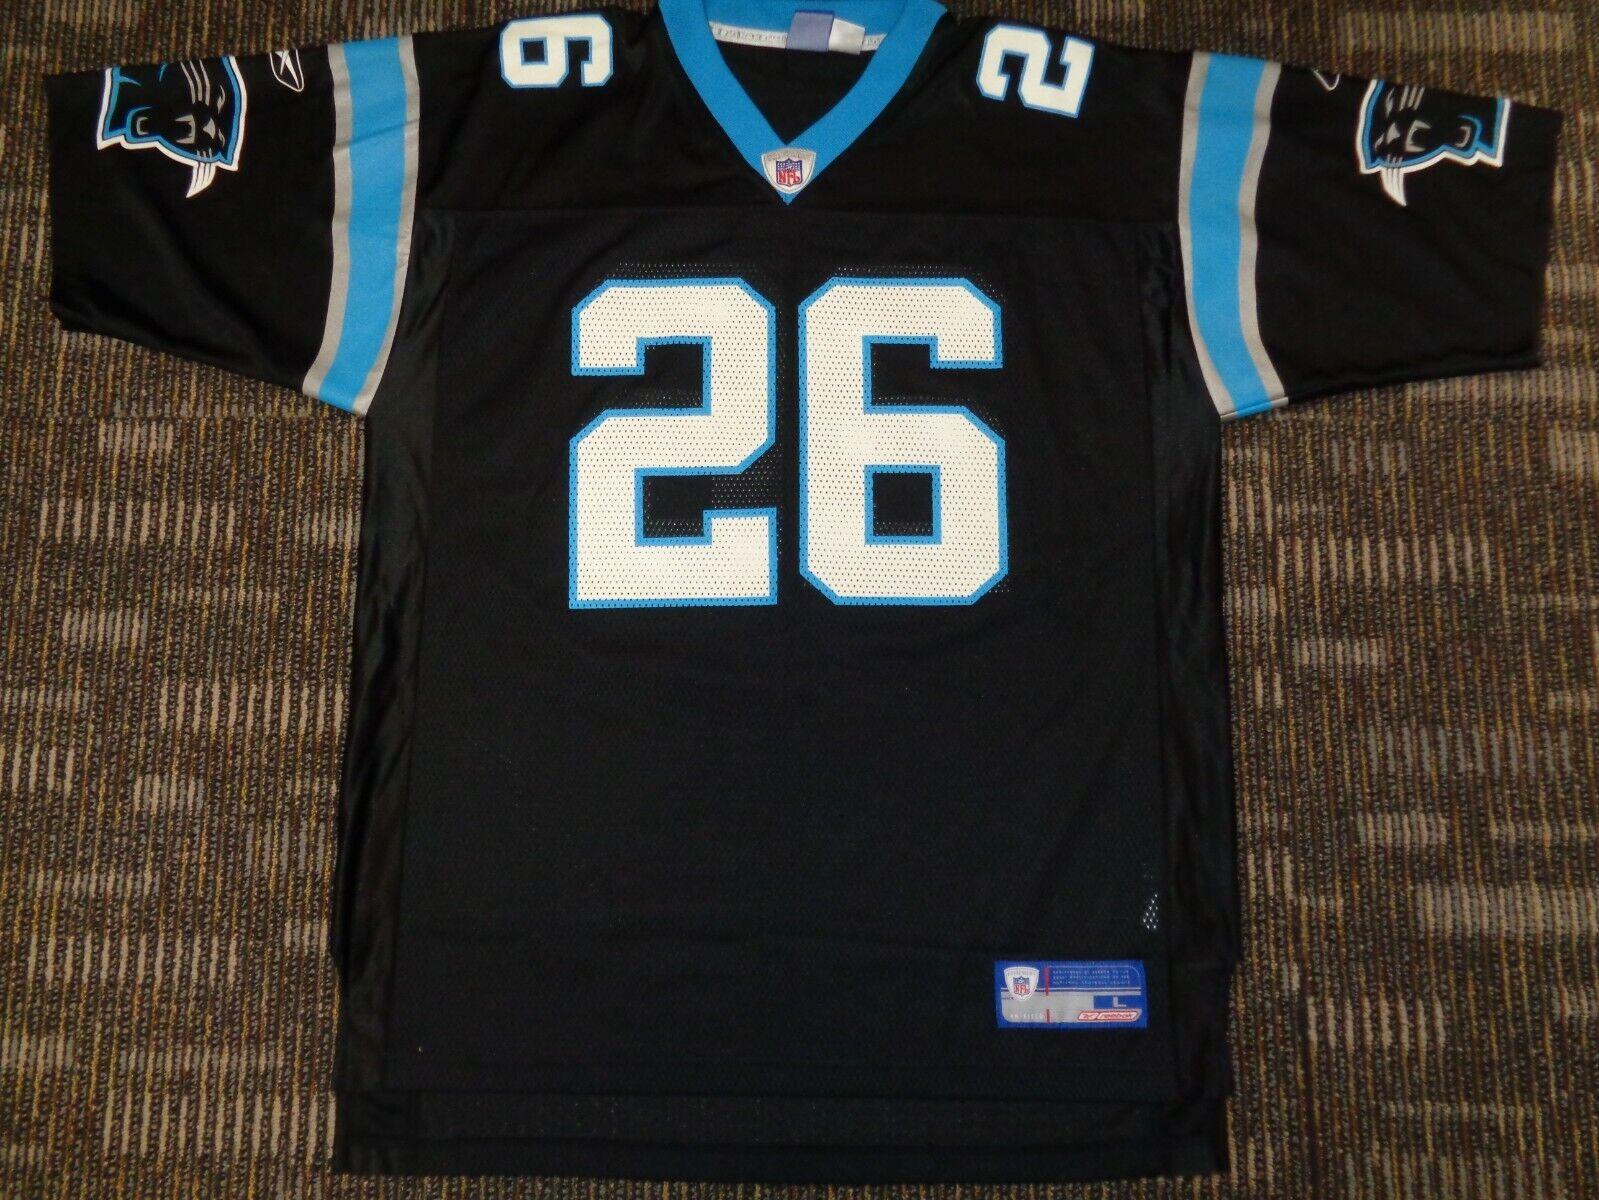 LOT-WESLEY WALLS LAMAR SMITH CAROLINA PANTHERS REEBOK BLACK NFL GAME JERSEYS L - $59.99